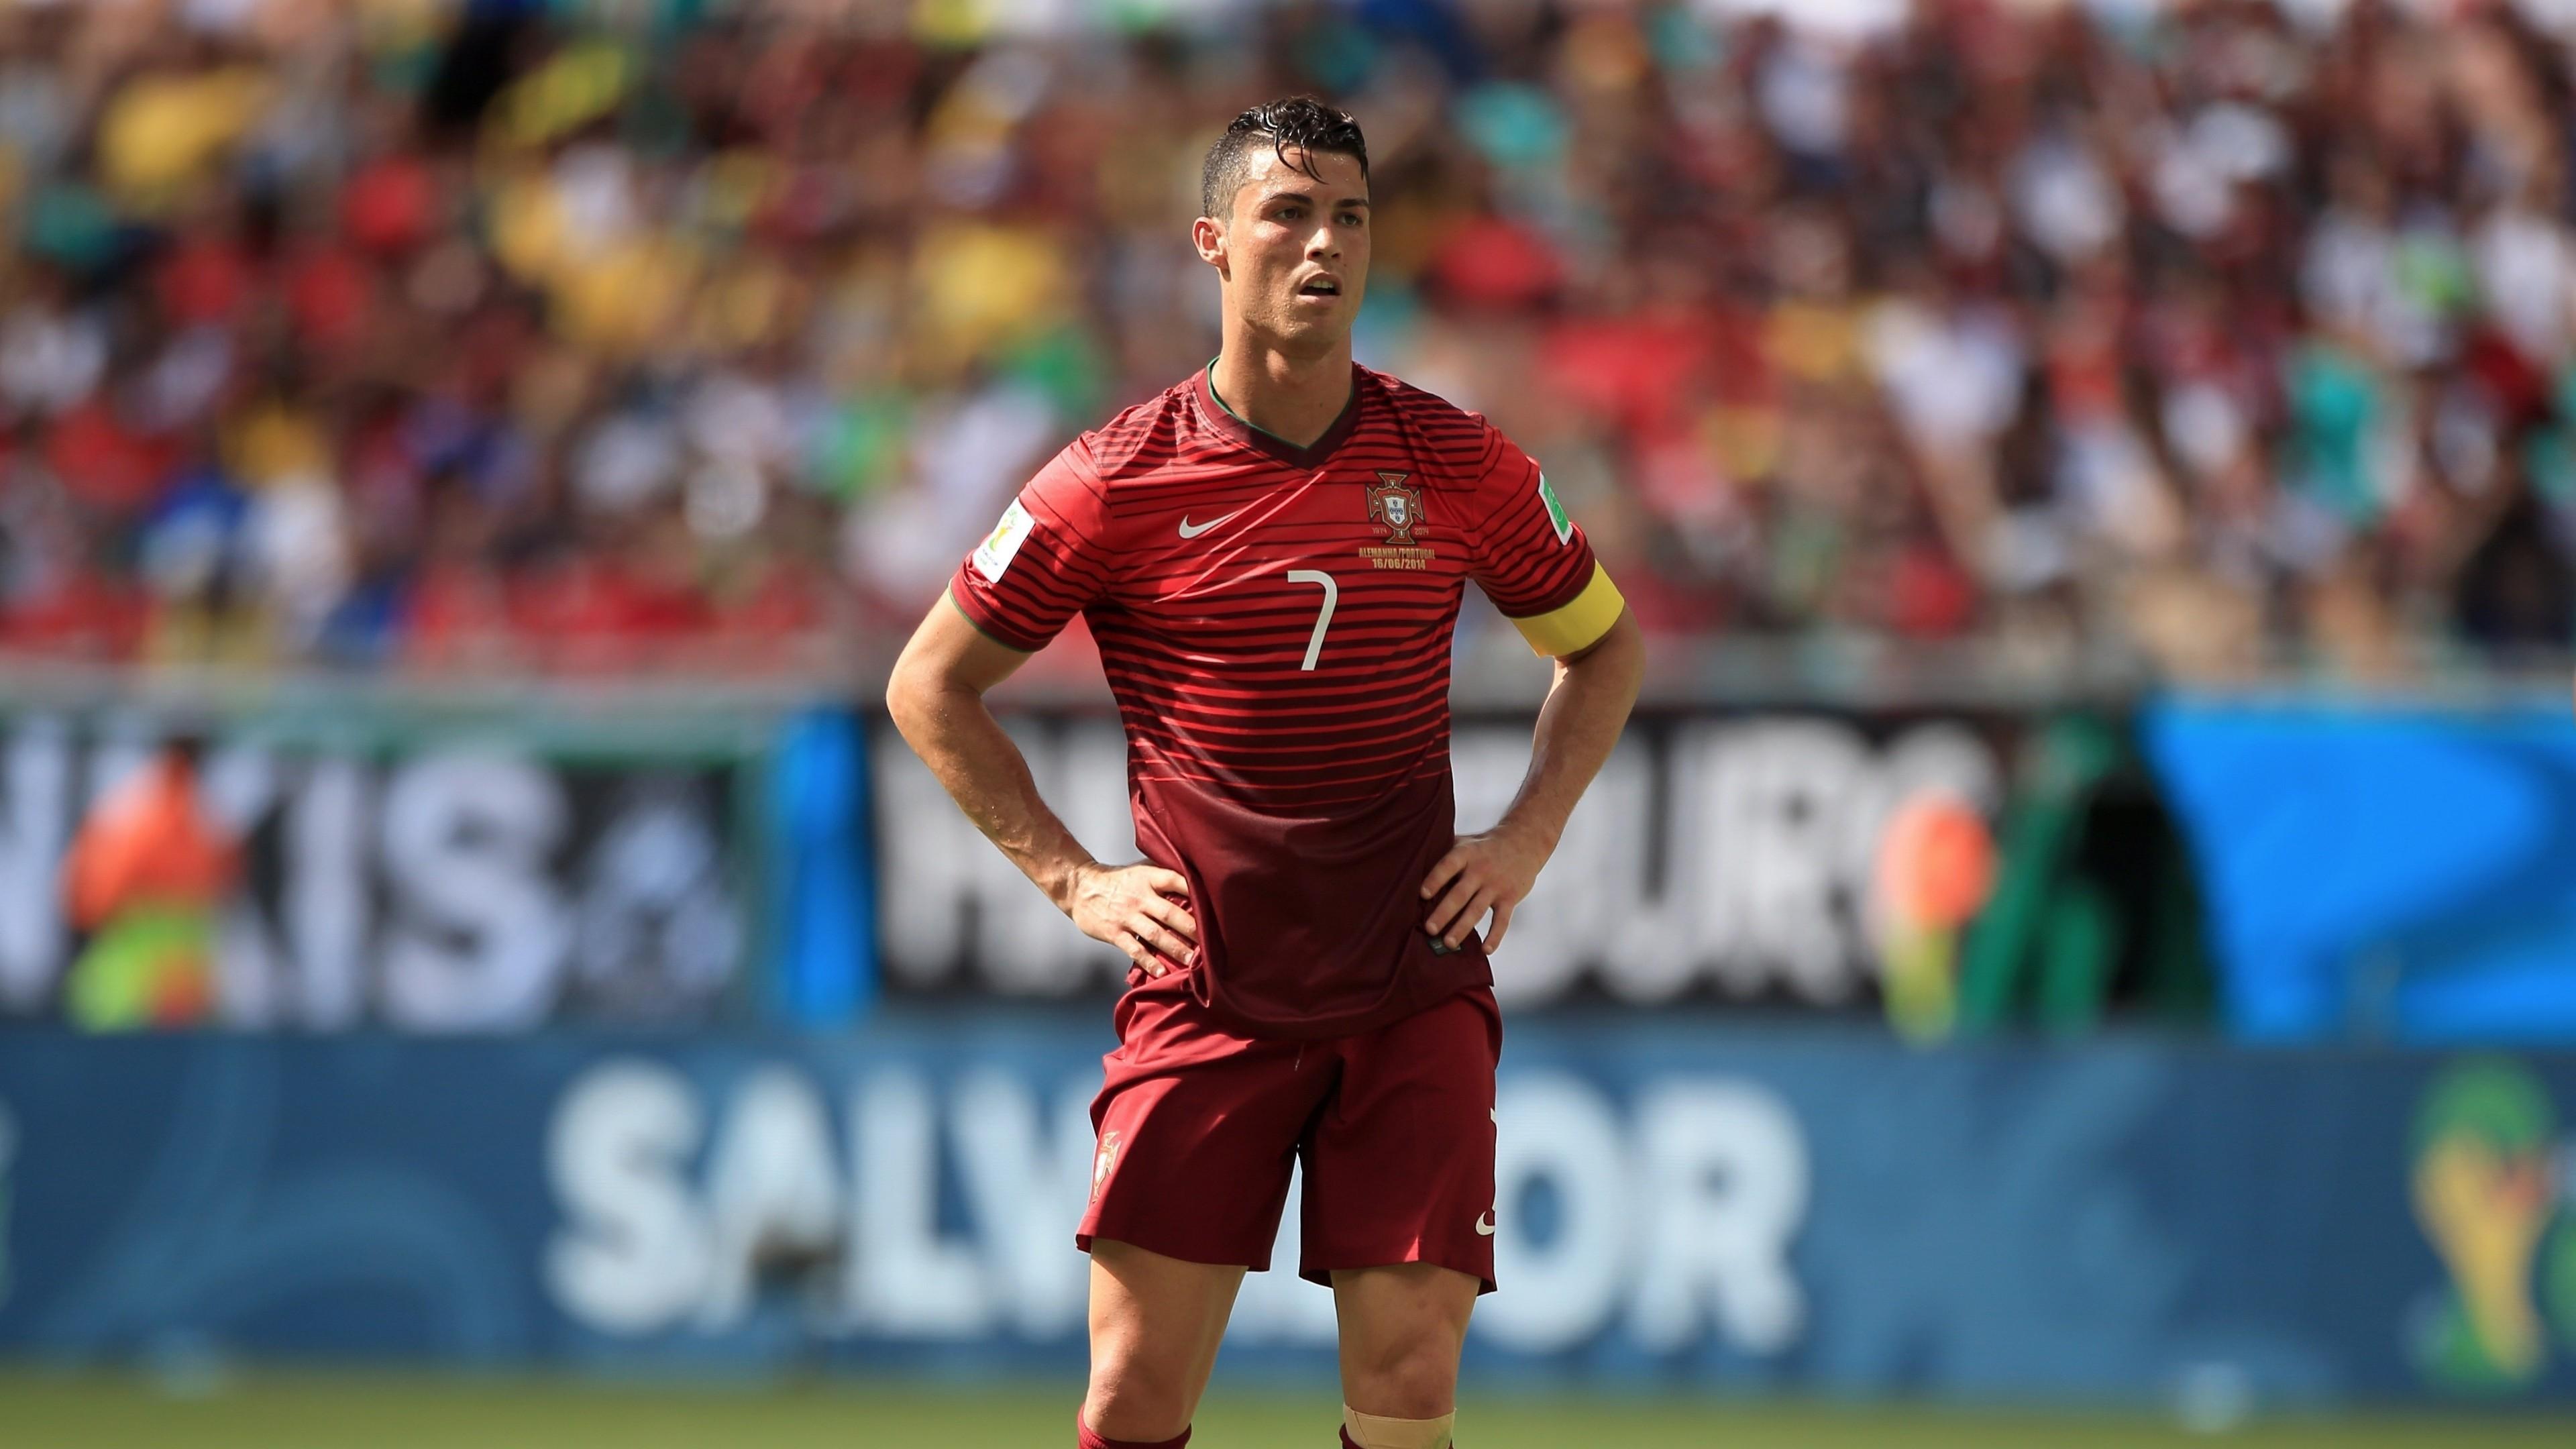 4k Ultra Hd Wallpaper Football: Cristiano Ronaldo Wallpaper 1080p (74+ Images